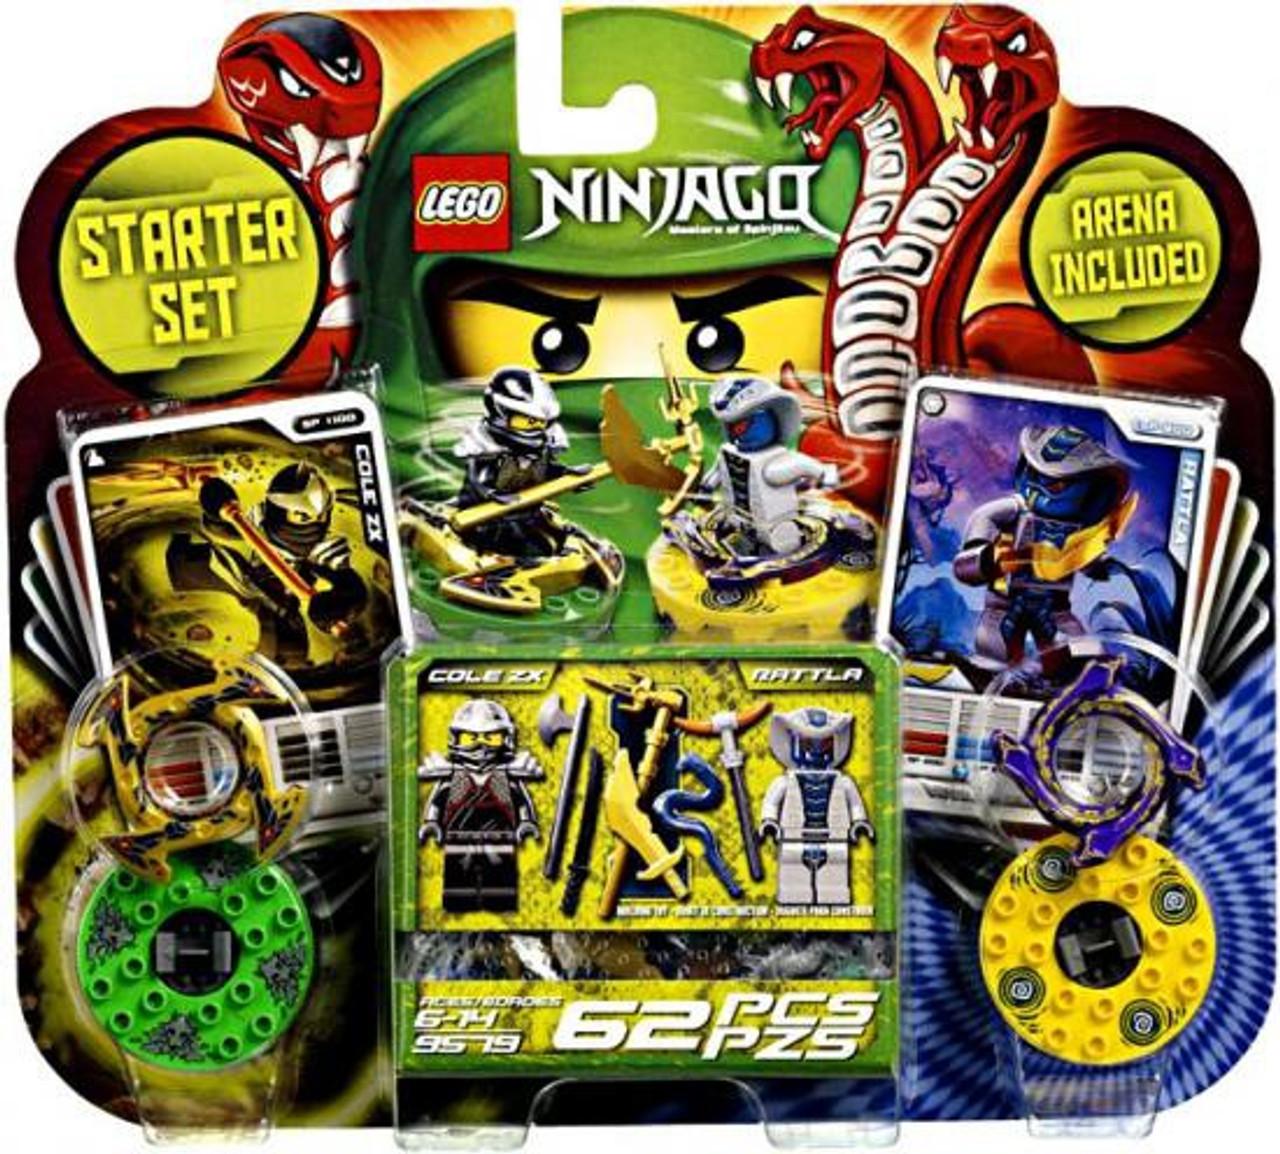 LEGO Ninjago Spinjitzu Spinners Starter Set Set #9579